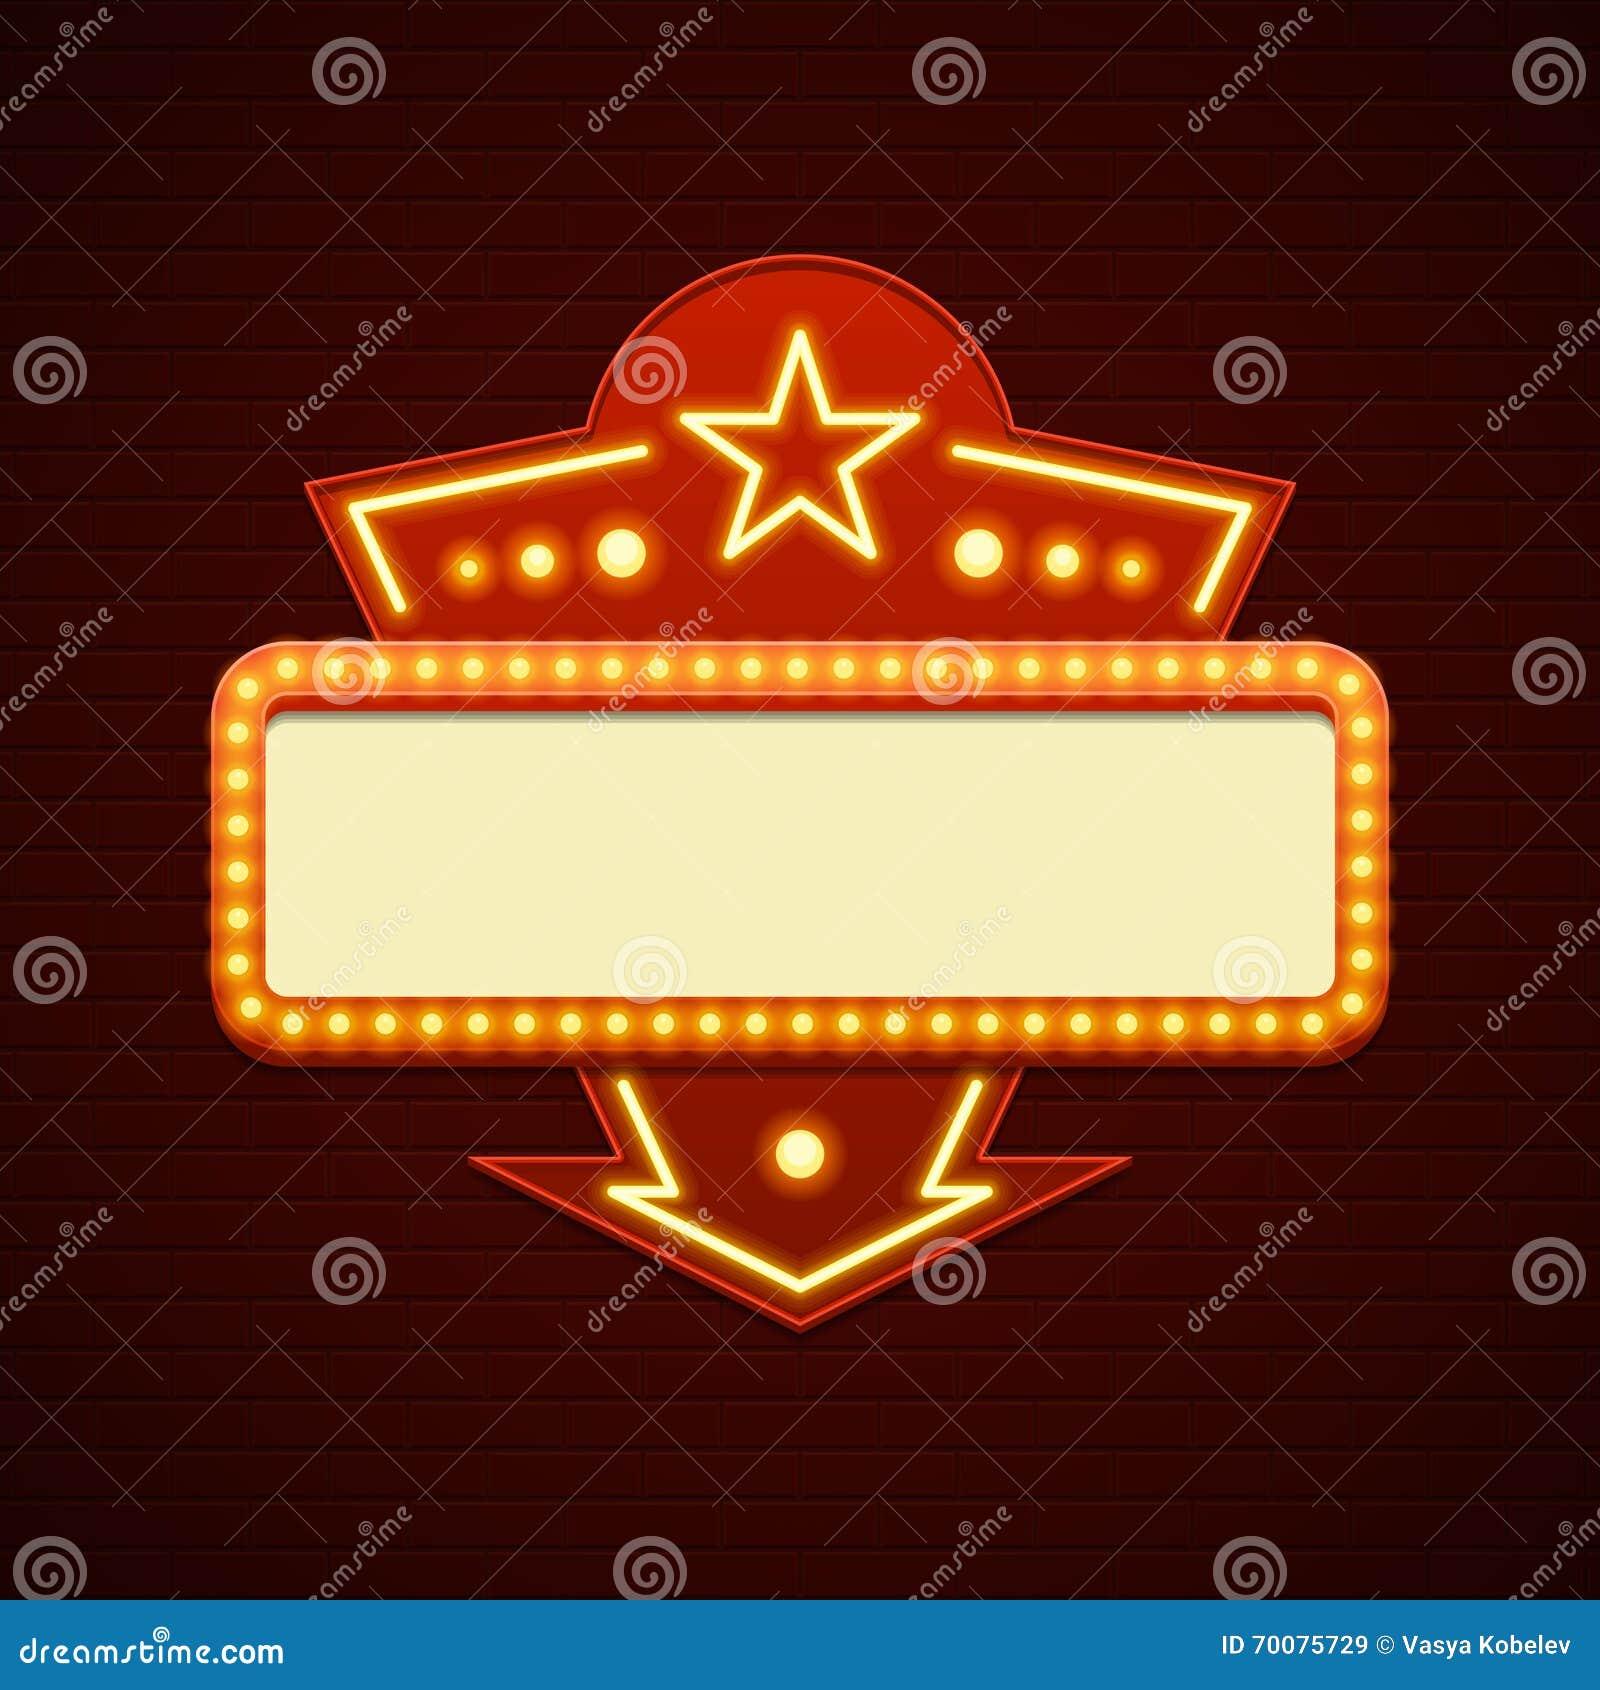 Retro Showtime Sign Design Cinema Signage Light Bulbs